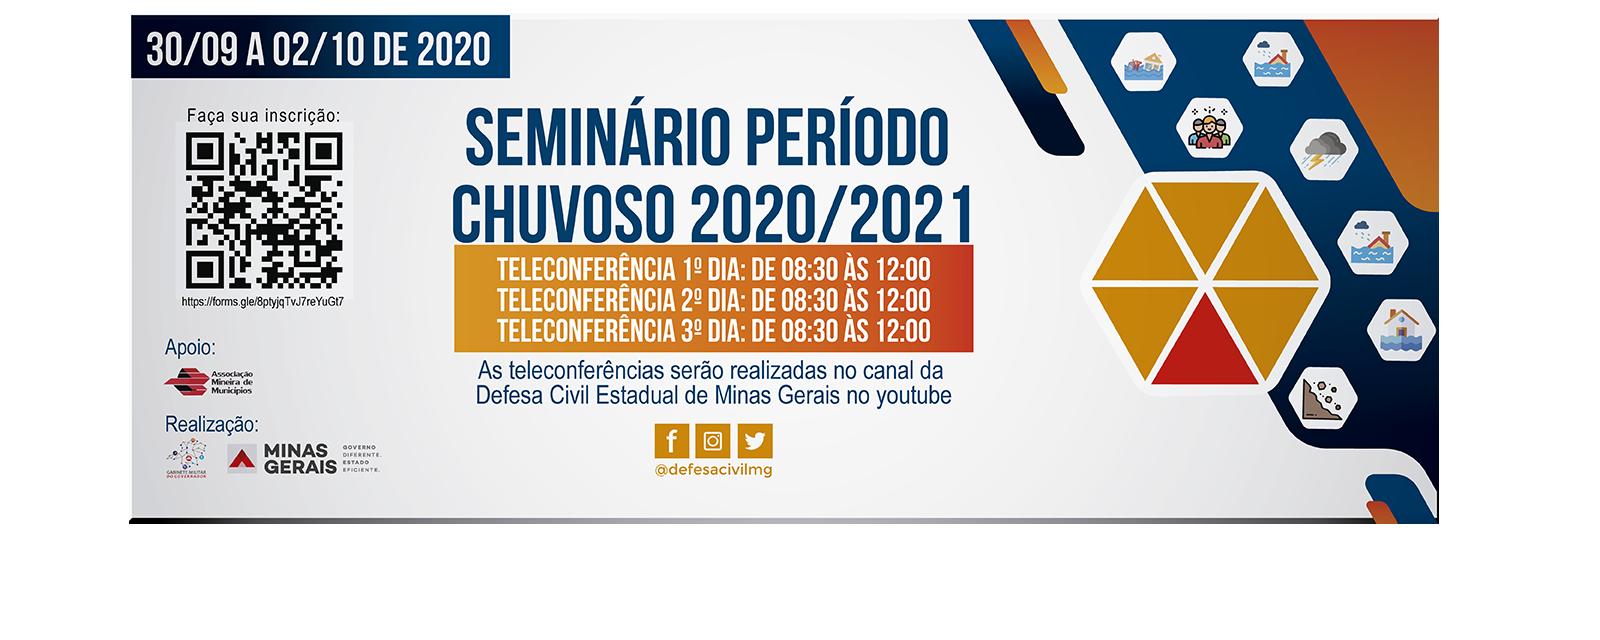 Seminário Periodo Chuvoso 2020-2021